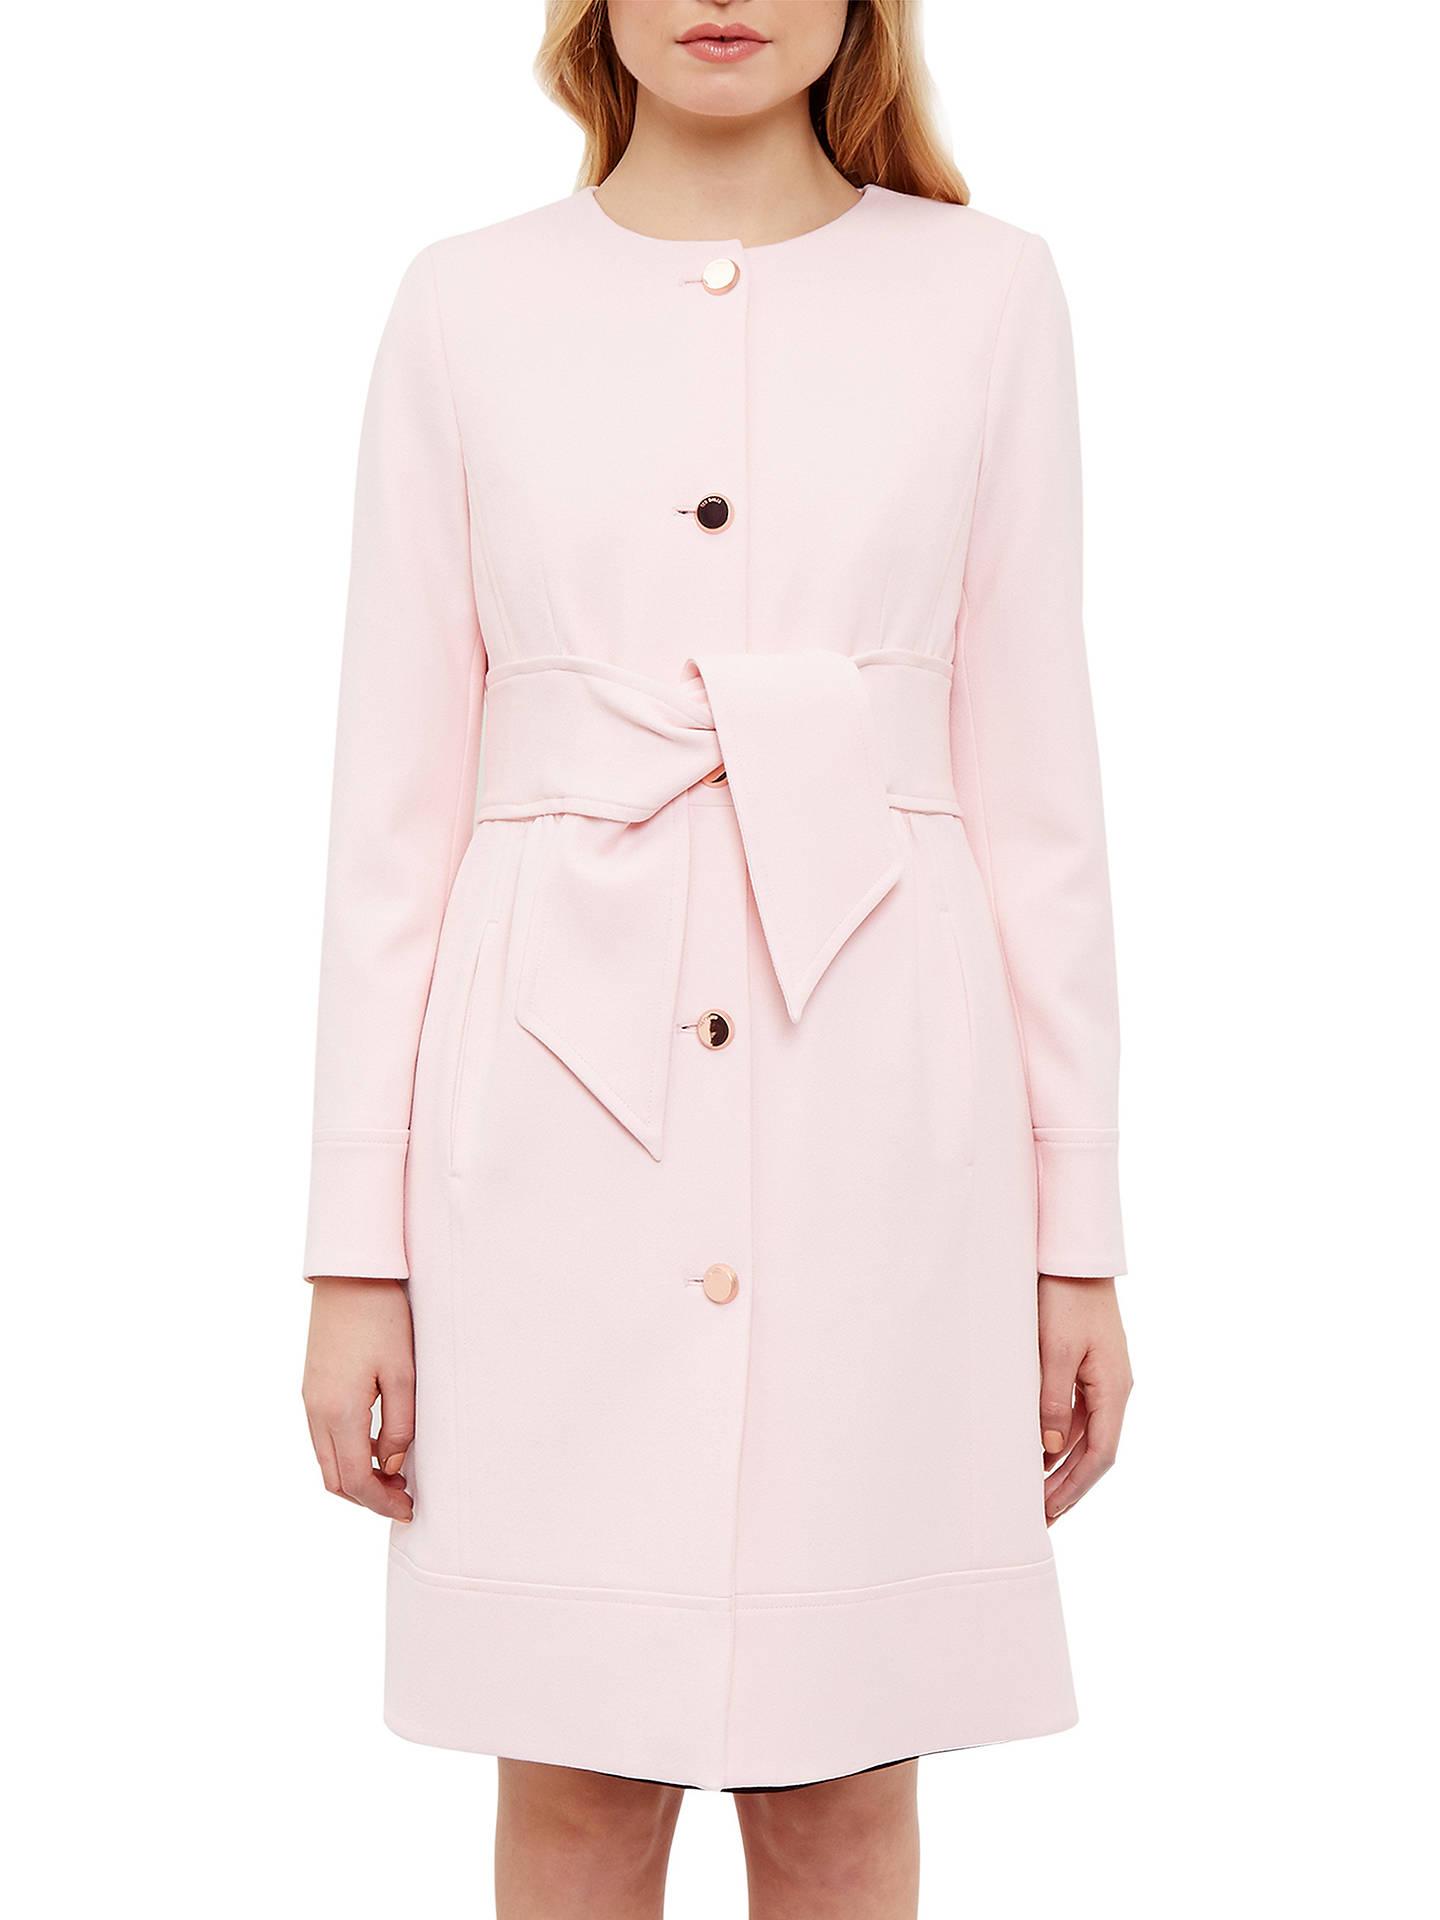 4b78aafa6 Buy Ted Baker Ceally Collarless Belted Coat